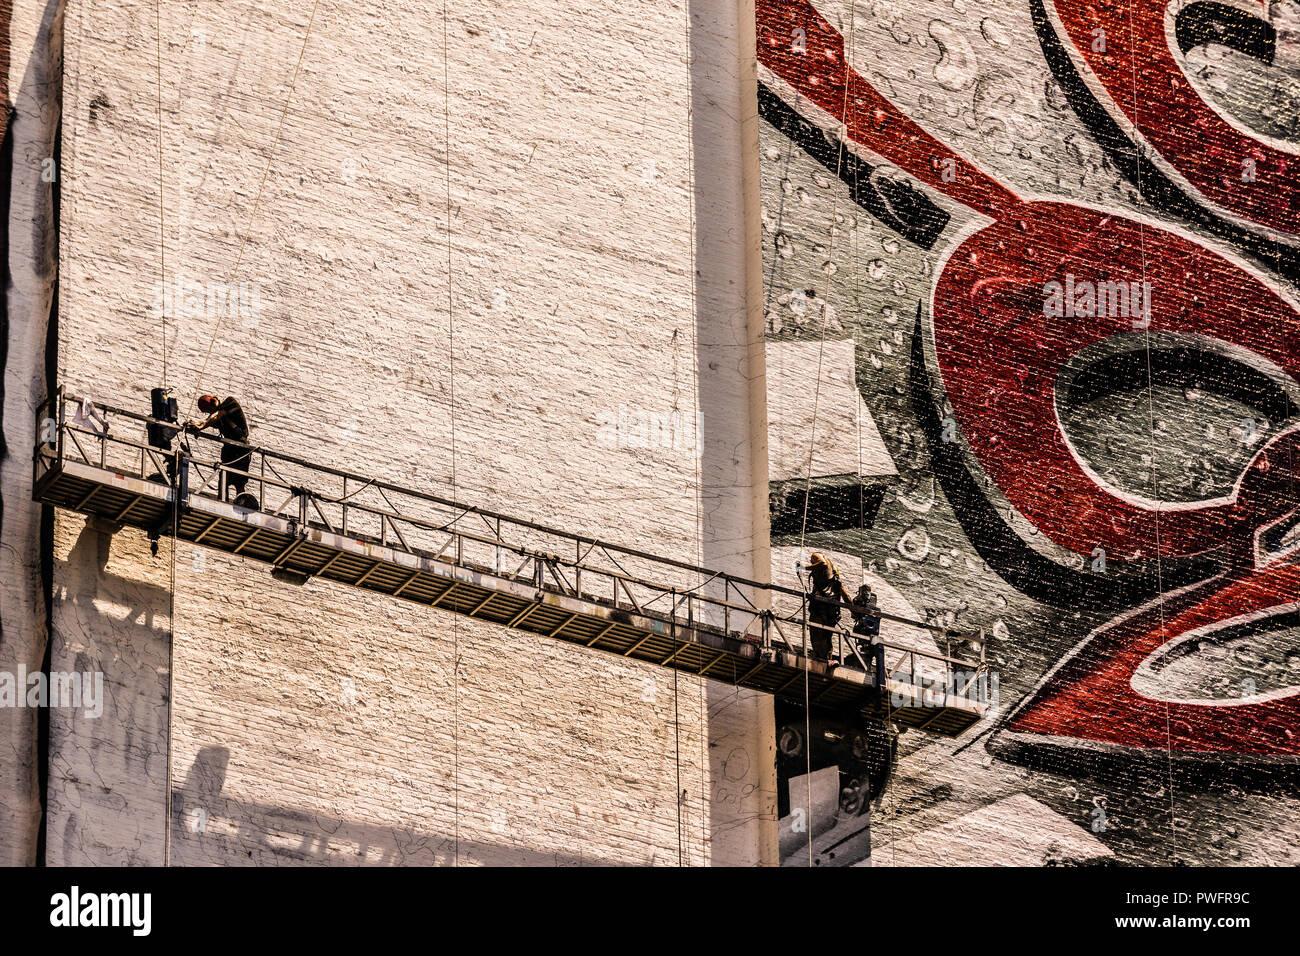 Billboard Painters Northeast corner of 34th. Street and 8th. Avenue Manhattan _ New York, New York, USA - Stock Image